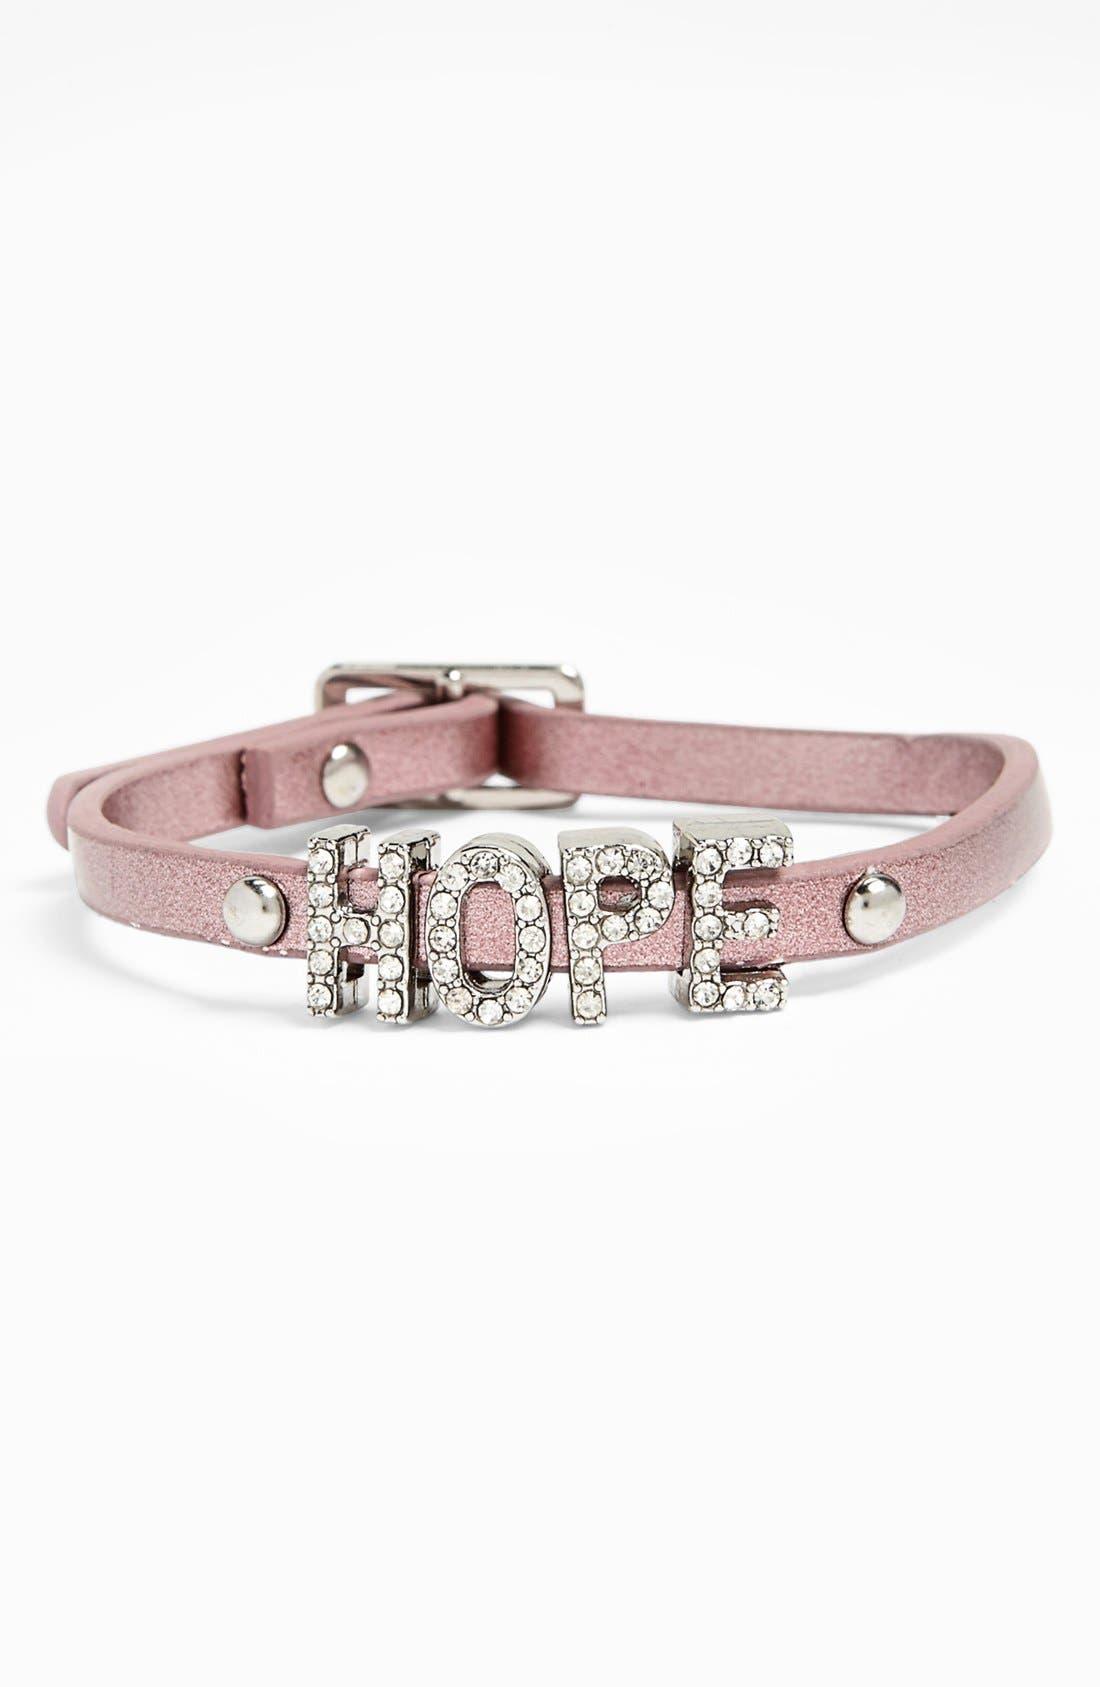 Main Image - BCBGeneration 'Sparkly Hope' Bracelet